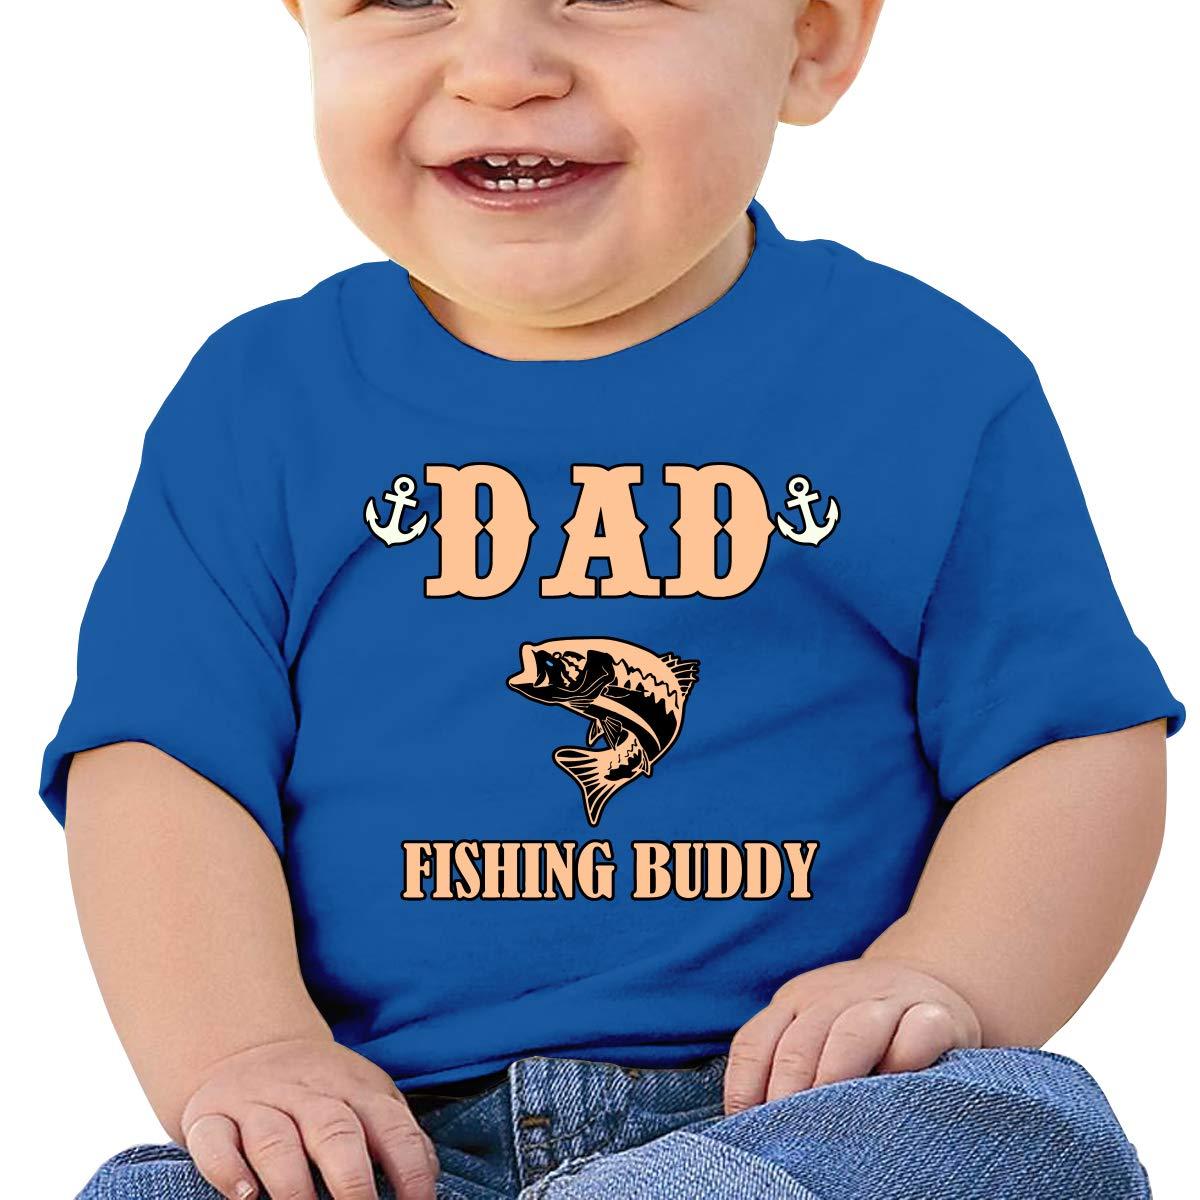 XHX403 Dads Fishing Buddy Infant Kids T Shirt Cotton Tee Toddler Baby 6-18M